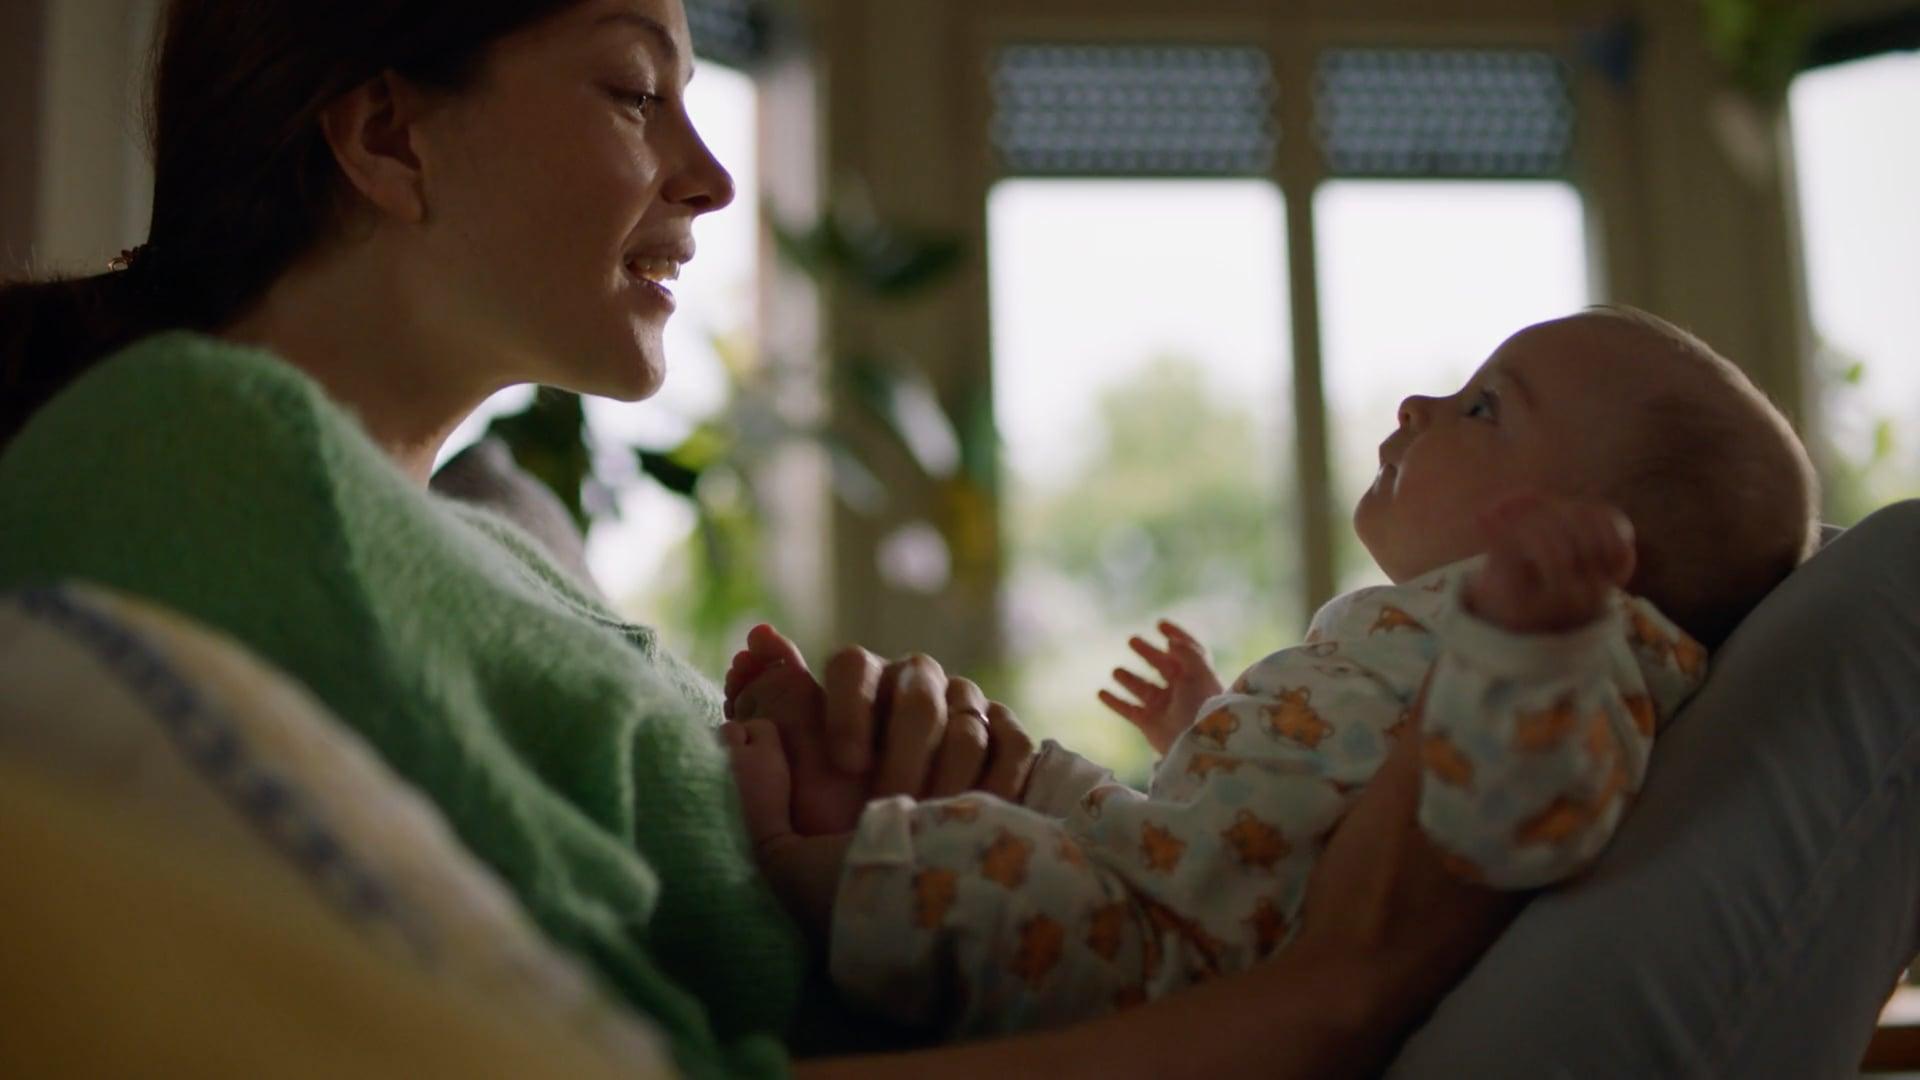 TOMMI BERTÉ | ANNA'S BEST - Baby